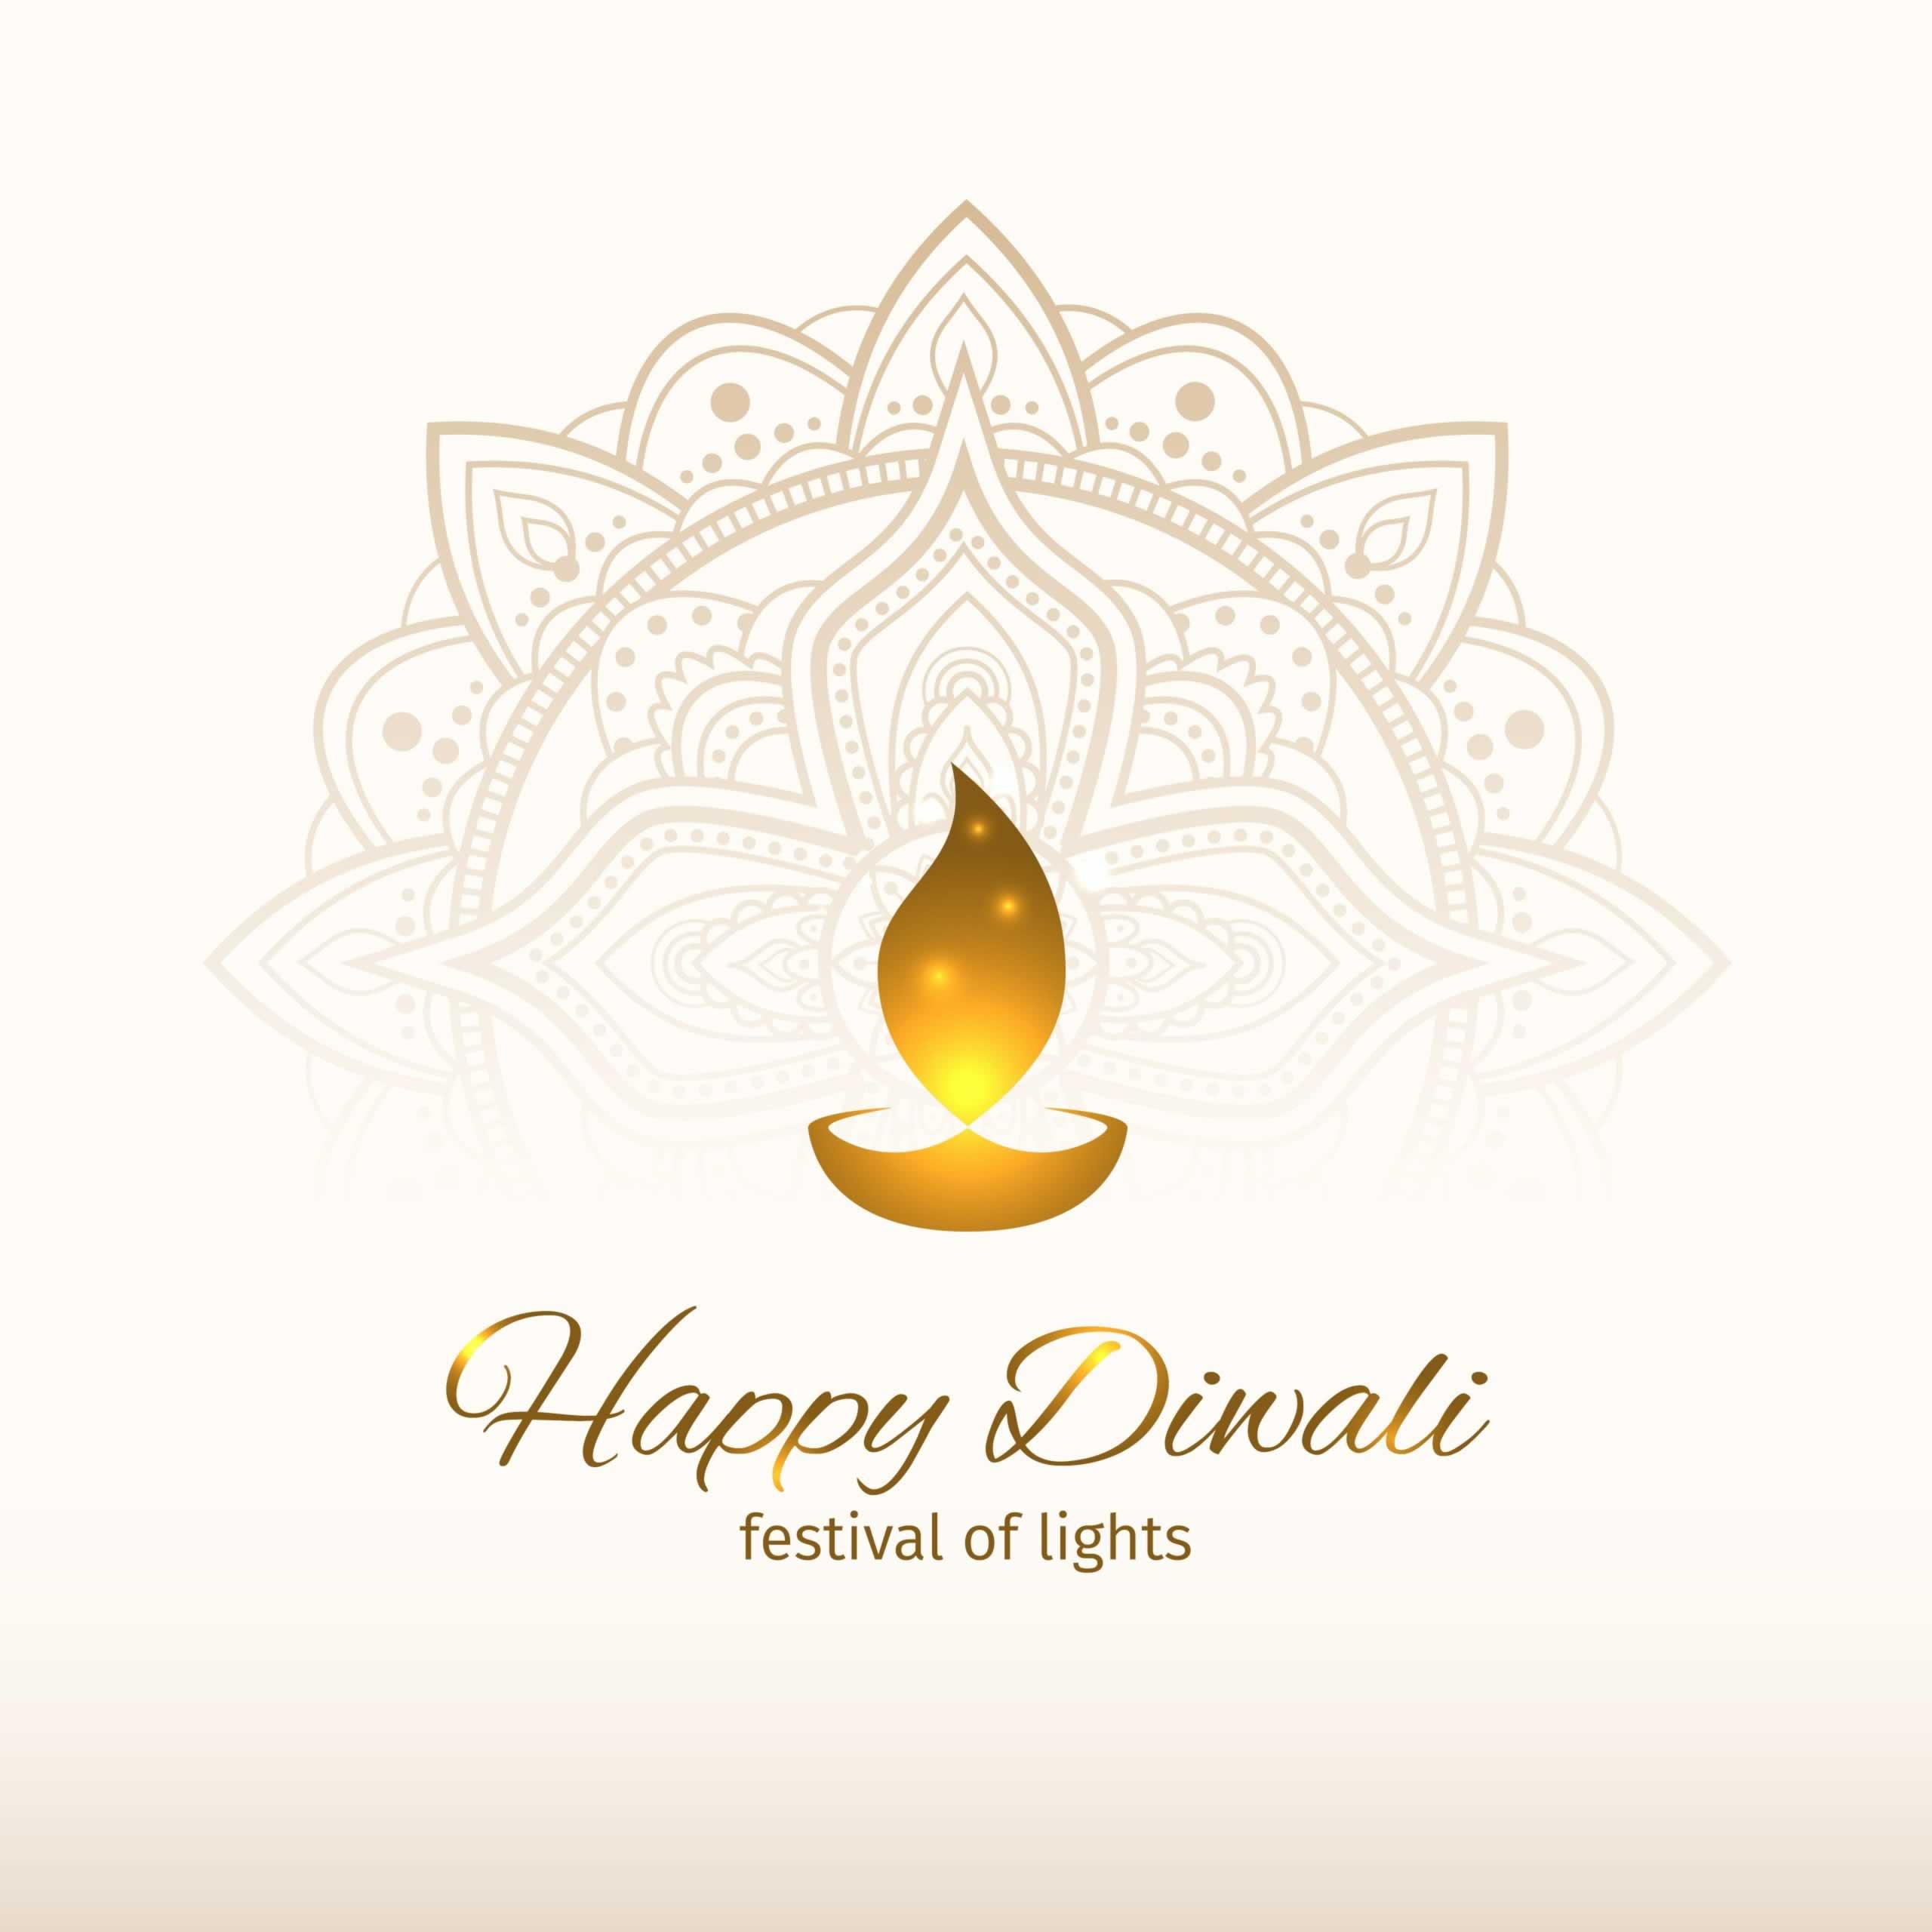 Happy diwali vector illustration. Design template with light festive golden background. Festive diwali card. White background with mandala. Vector holiday illustration